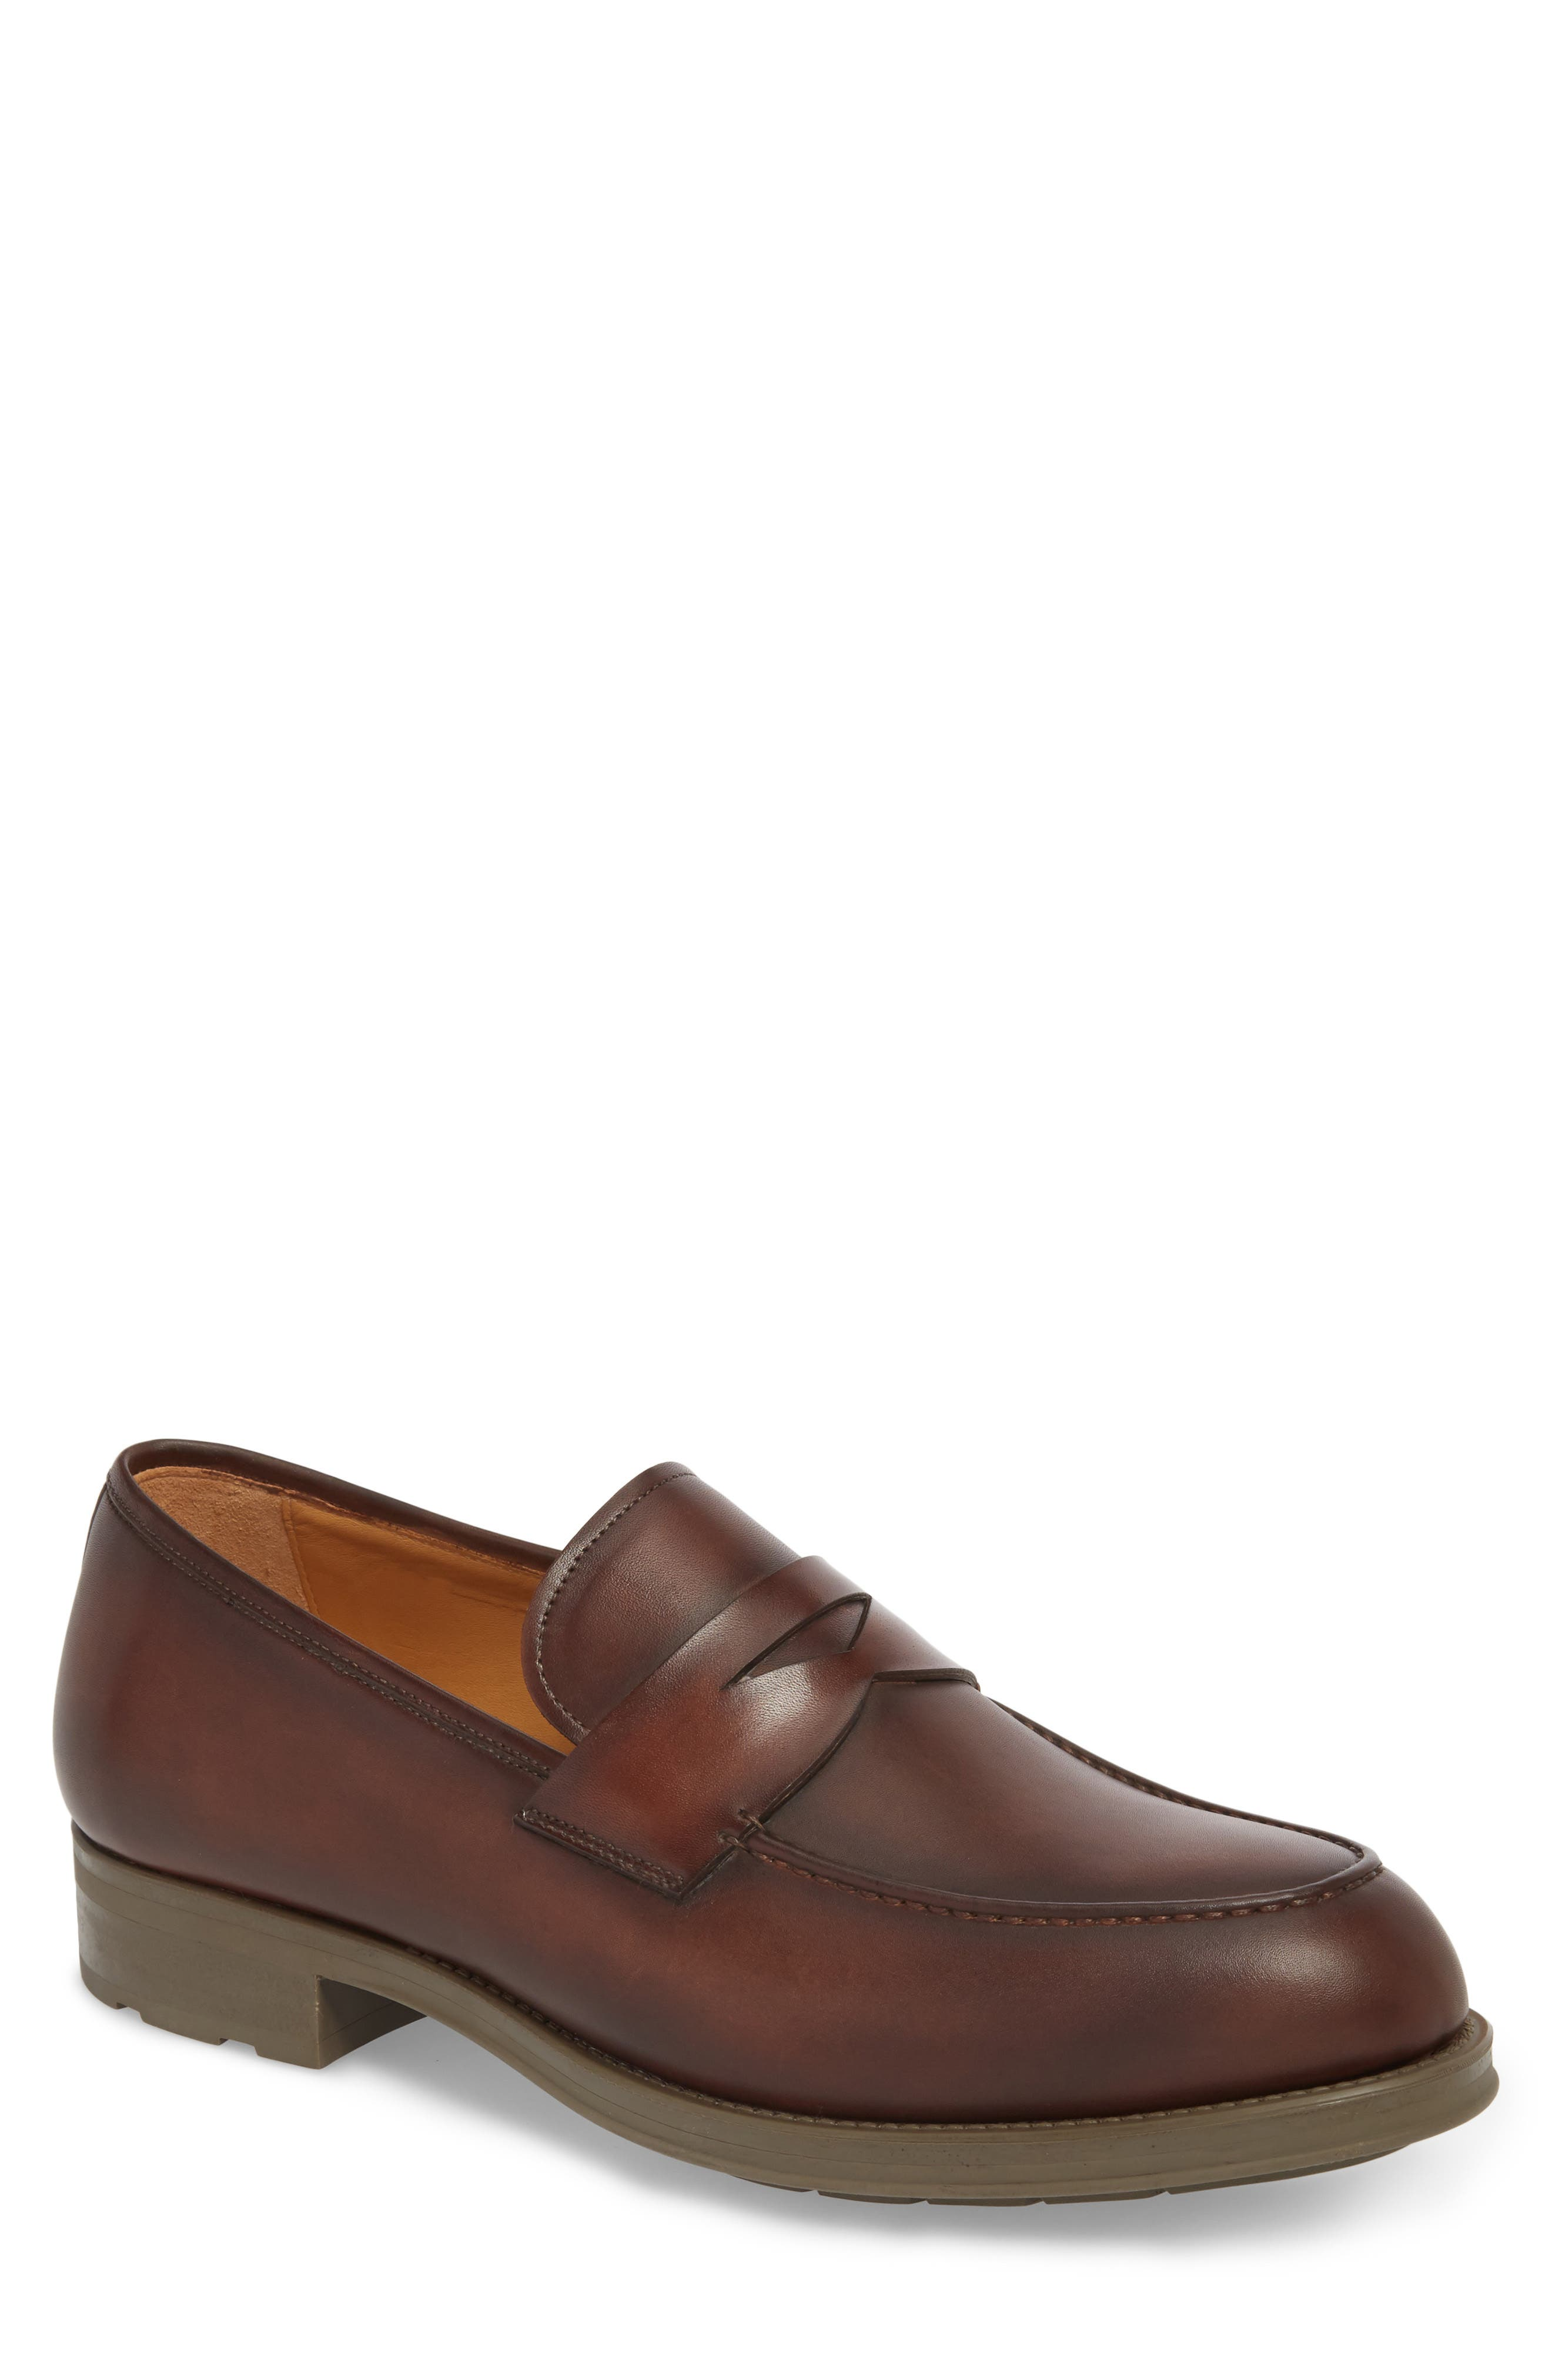 Bernardo Penny Loafer,                         Main,                         color, Brown Leather